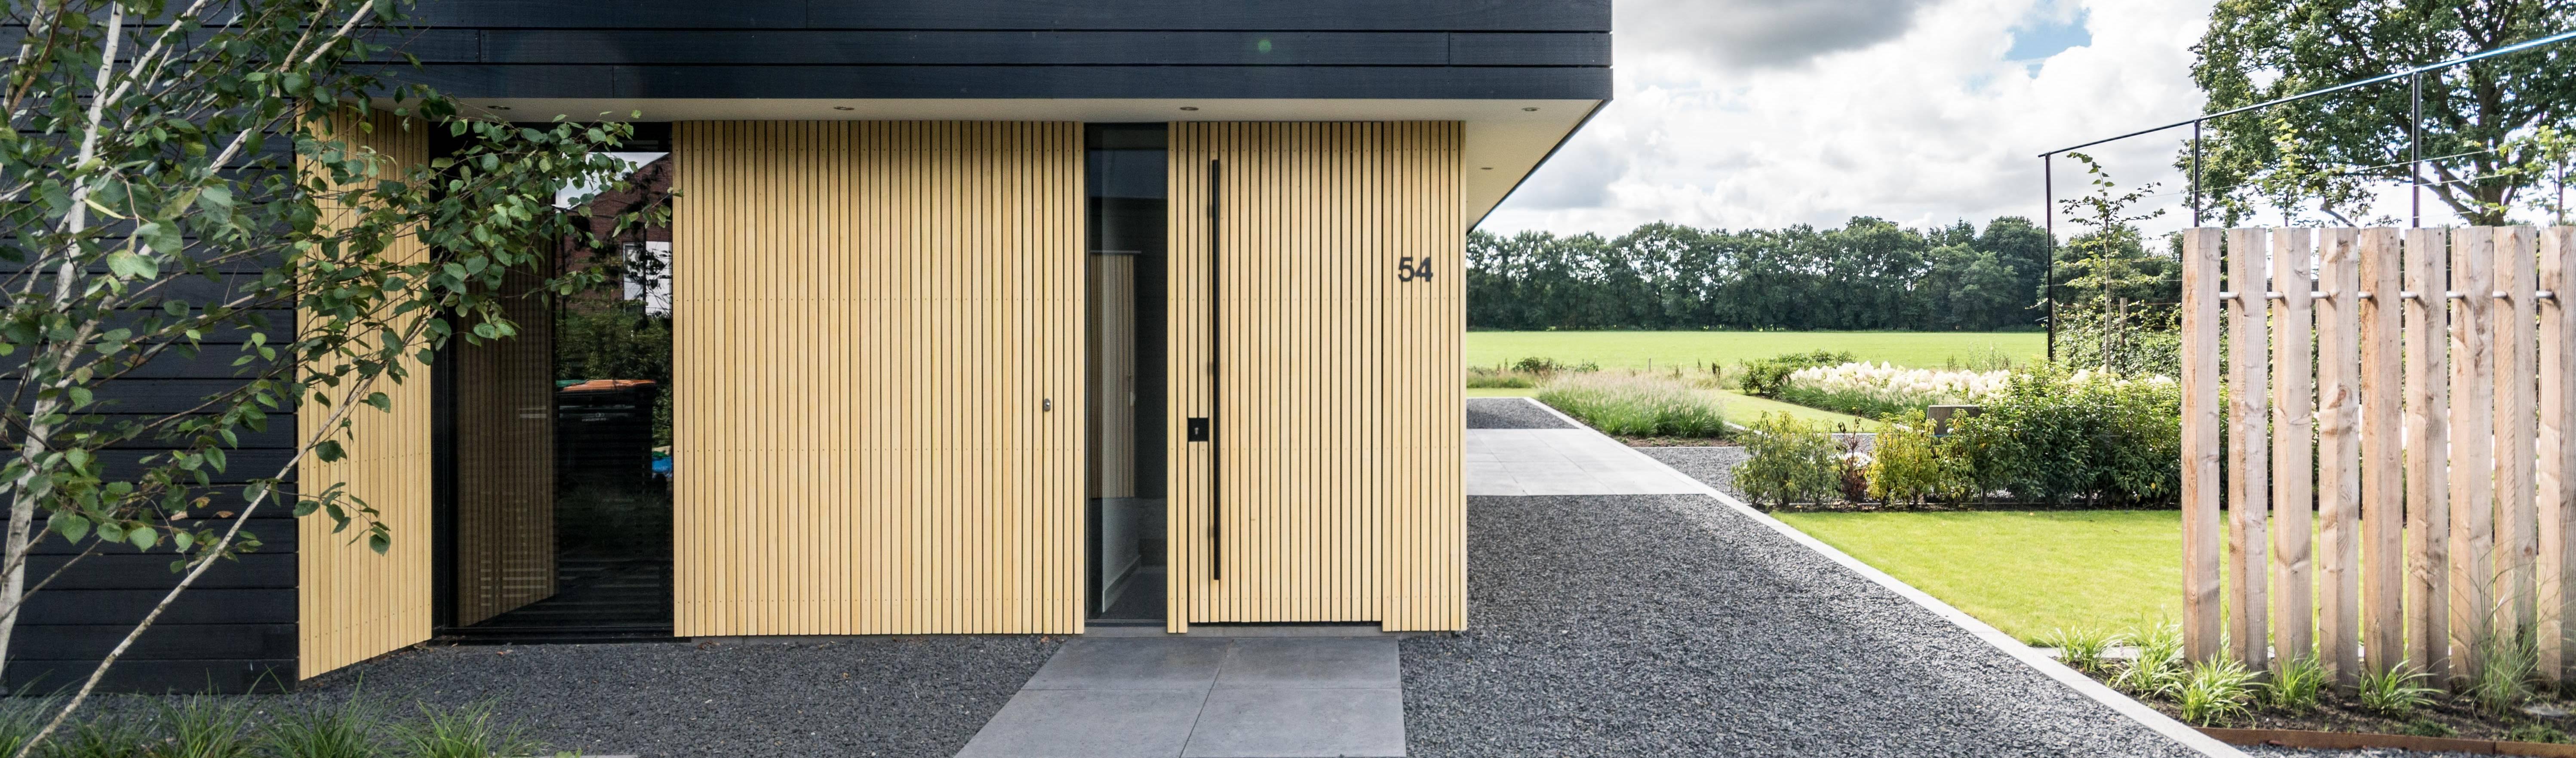 Ivo de Jong architect